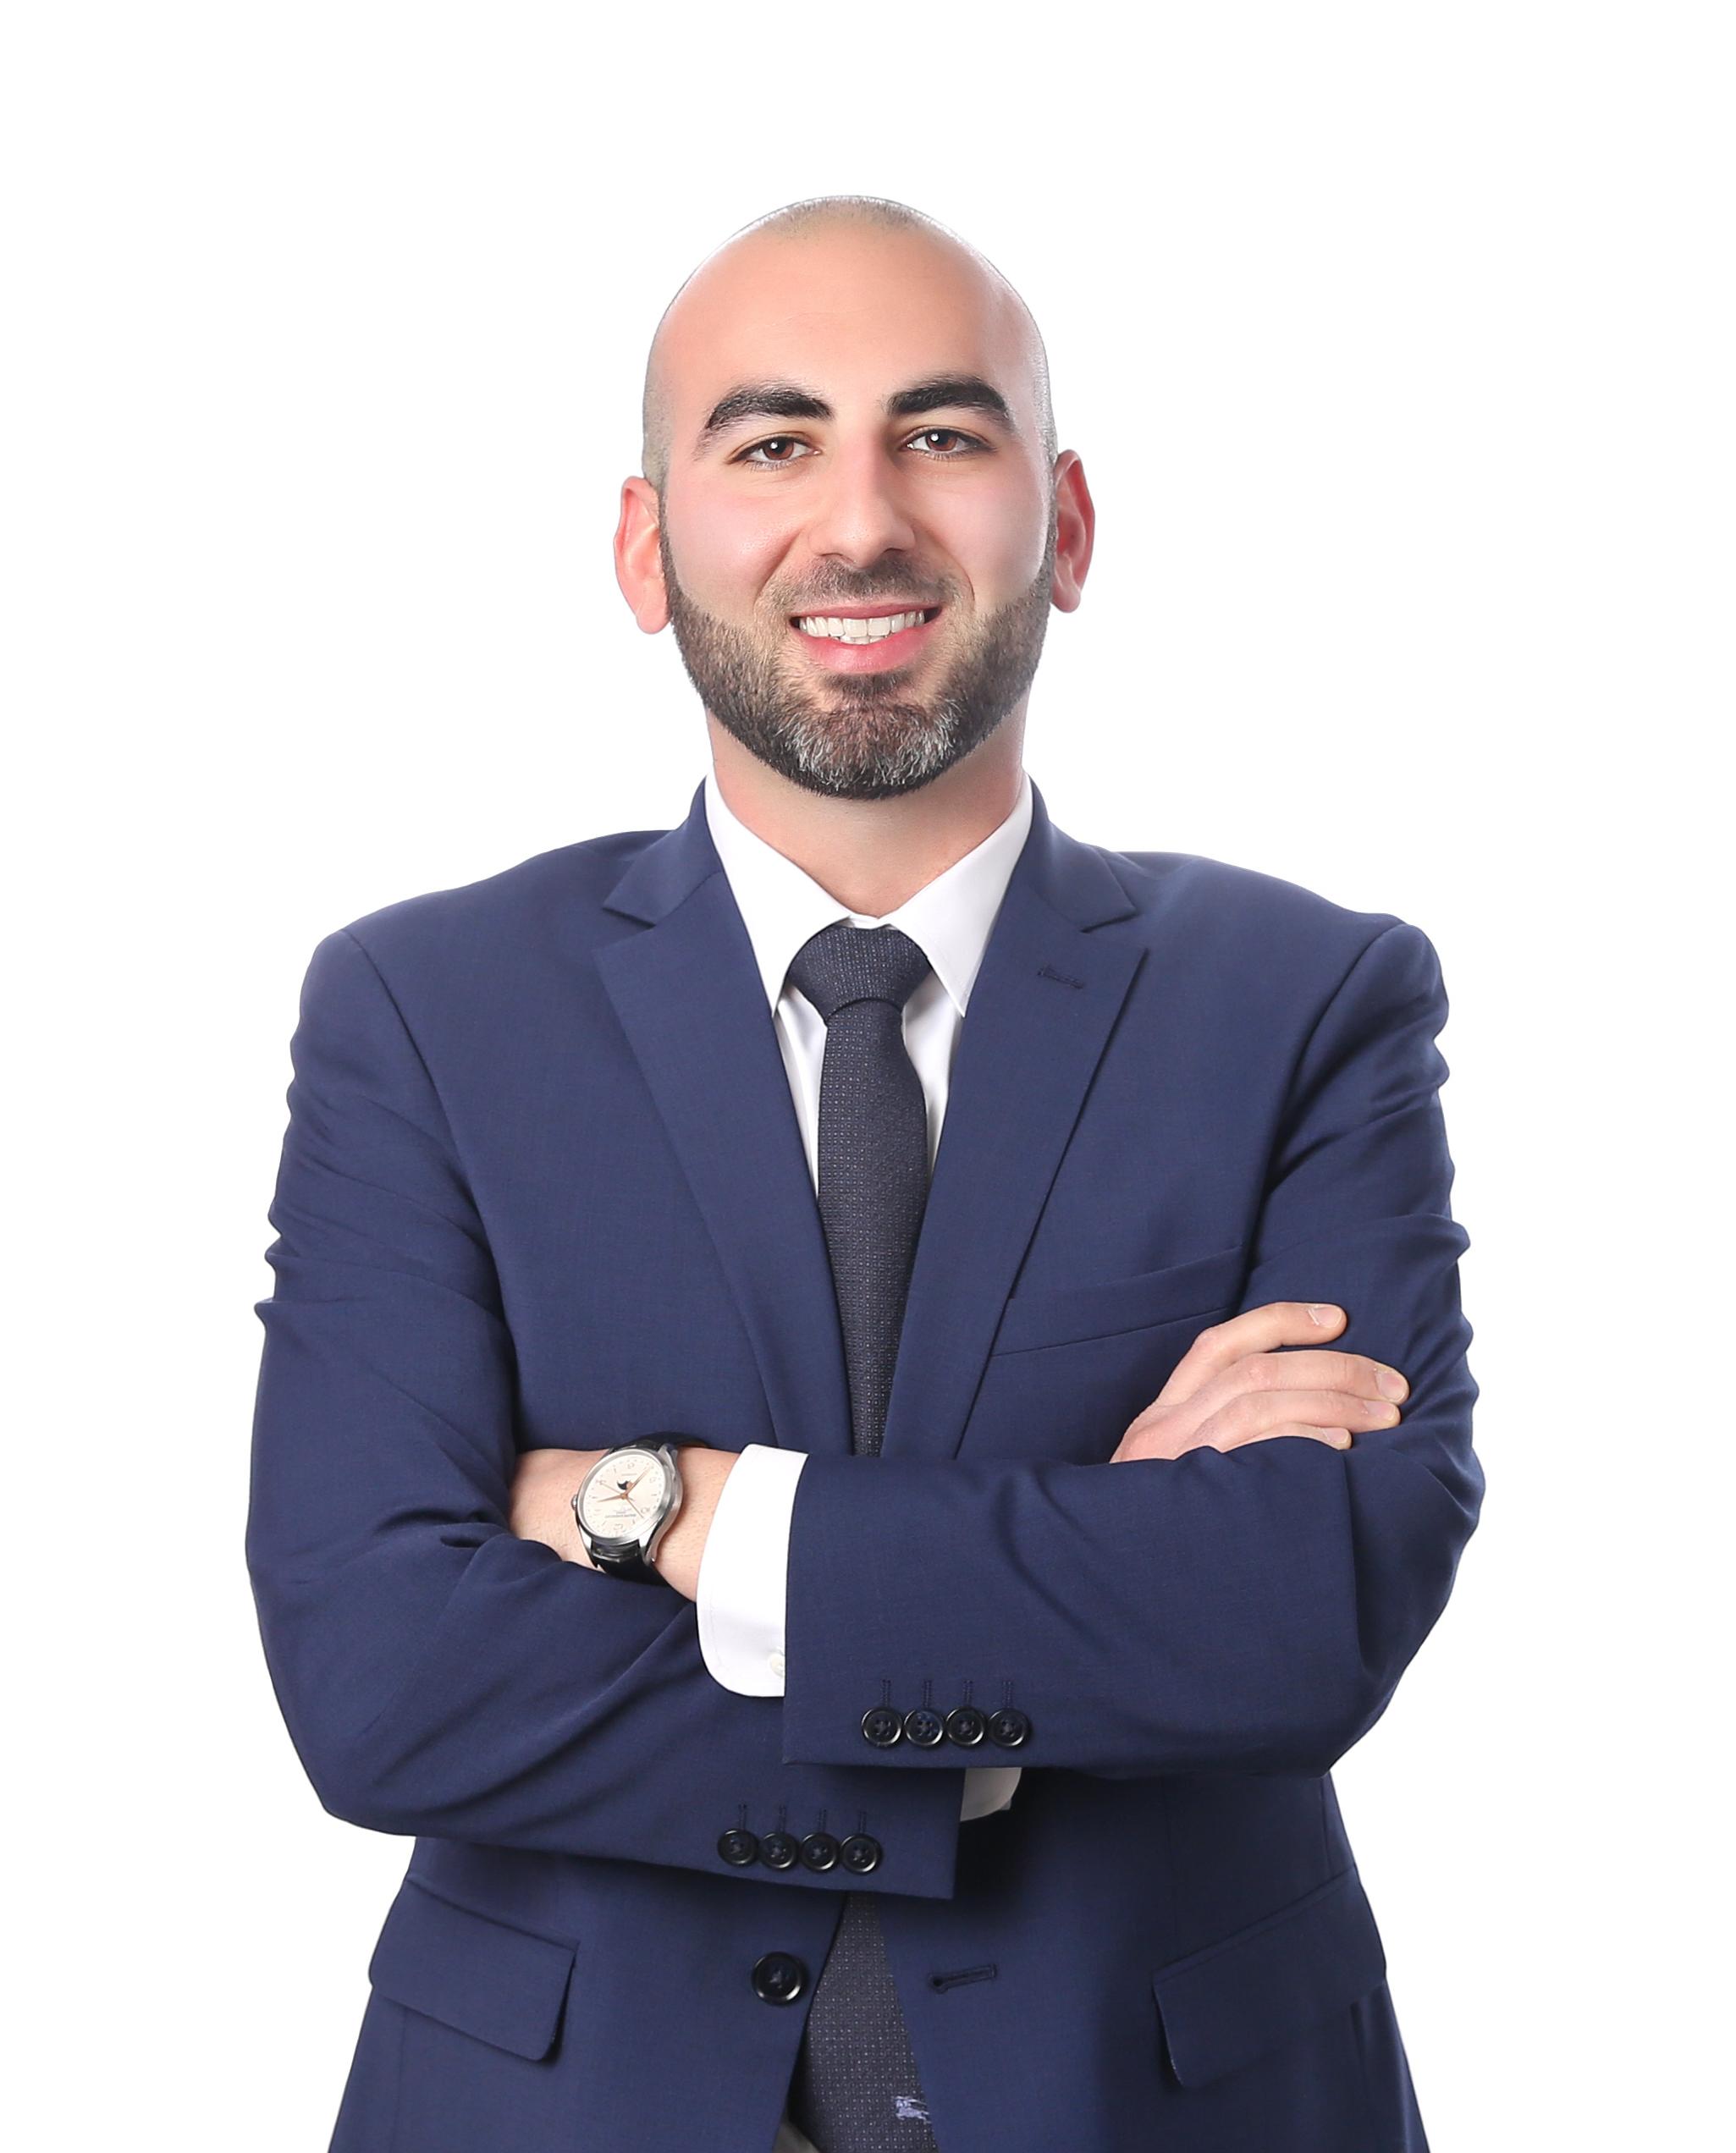 Alain Babaian - Broker, Realtor®, PMC